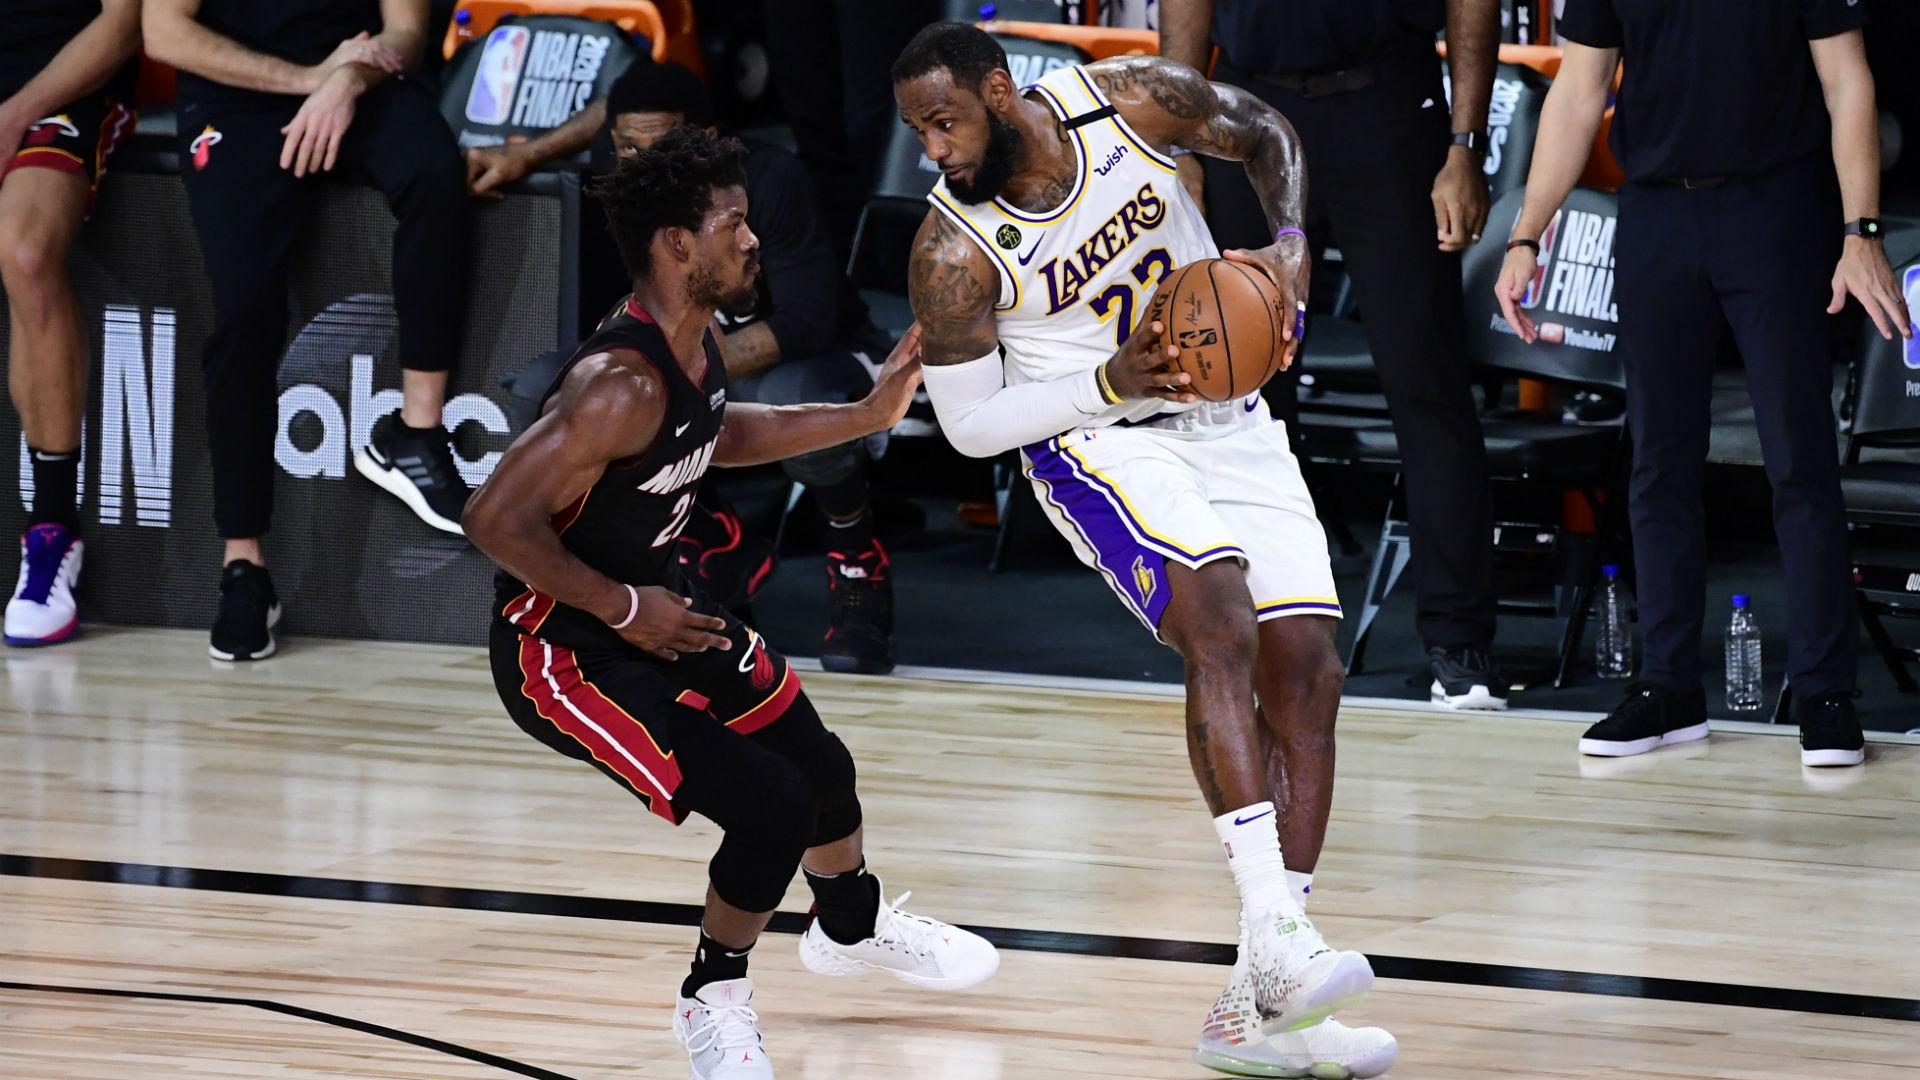 When does the NBA season start 2020-21? Latest news on regular season schedule, fan attendance